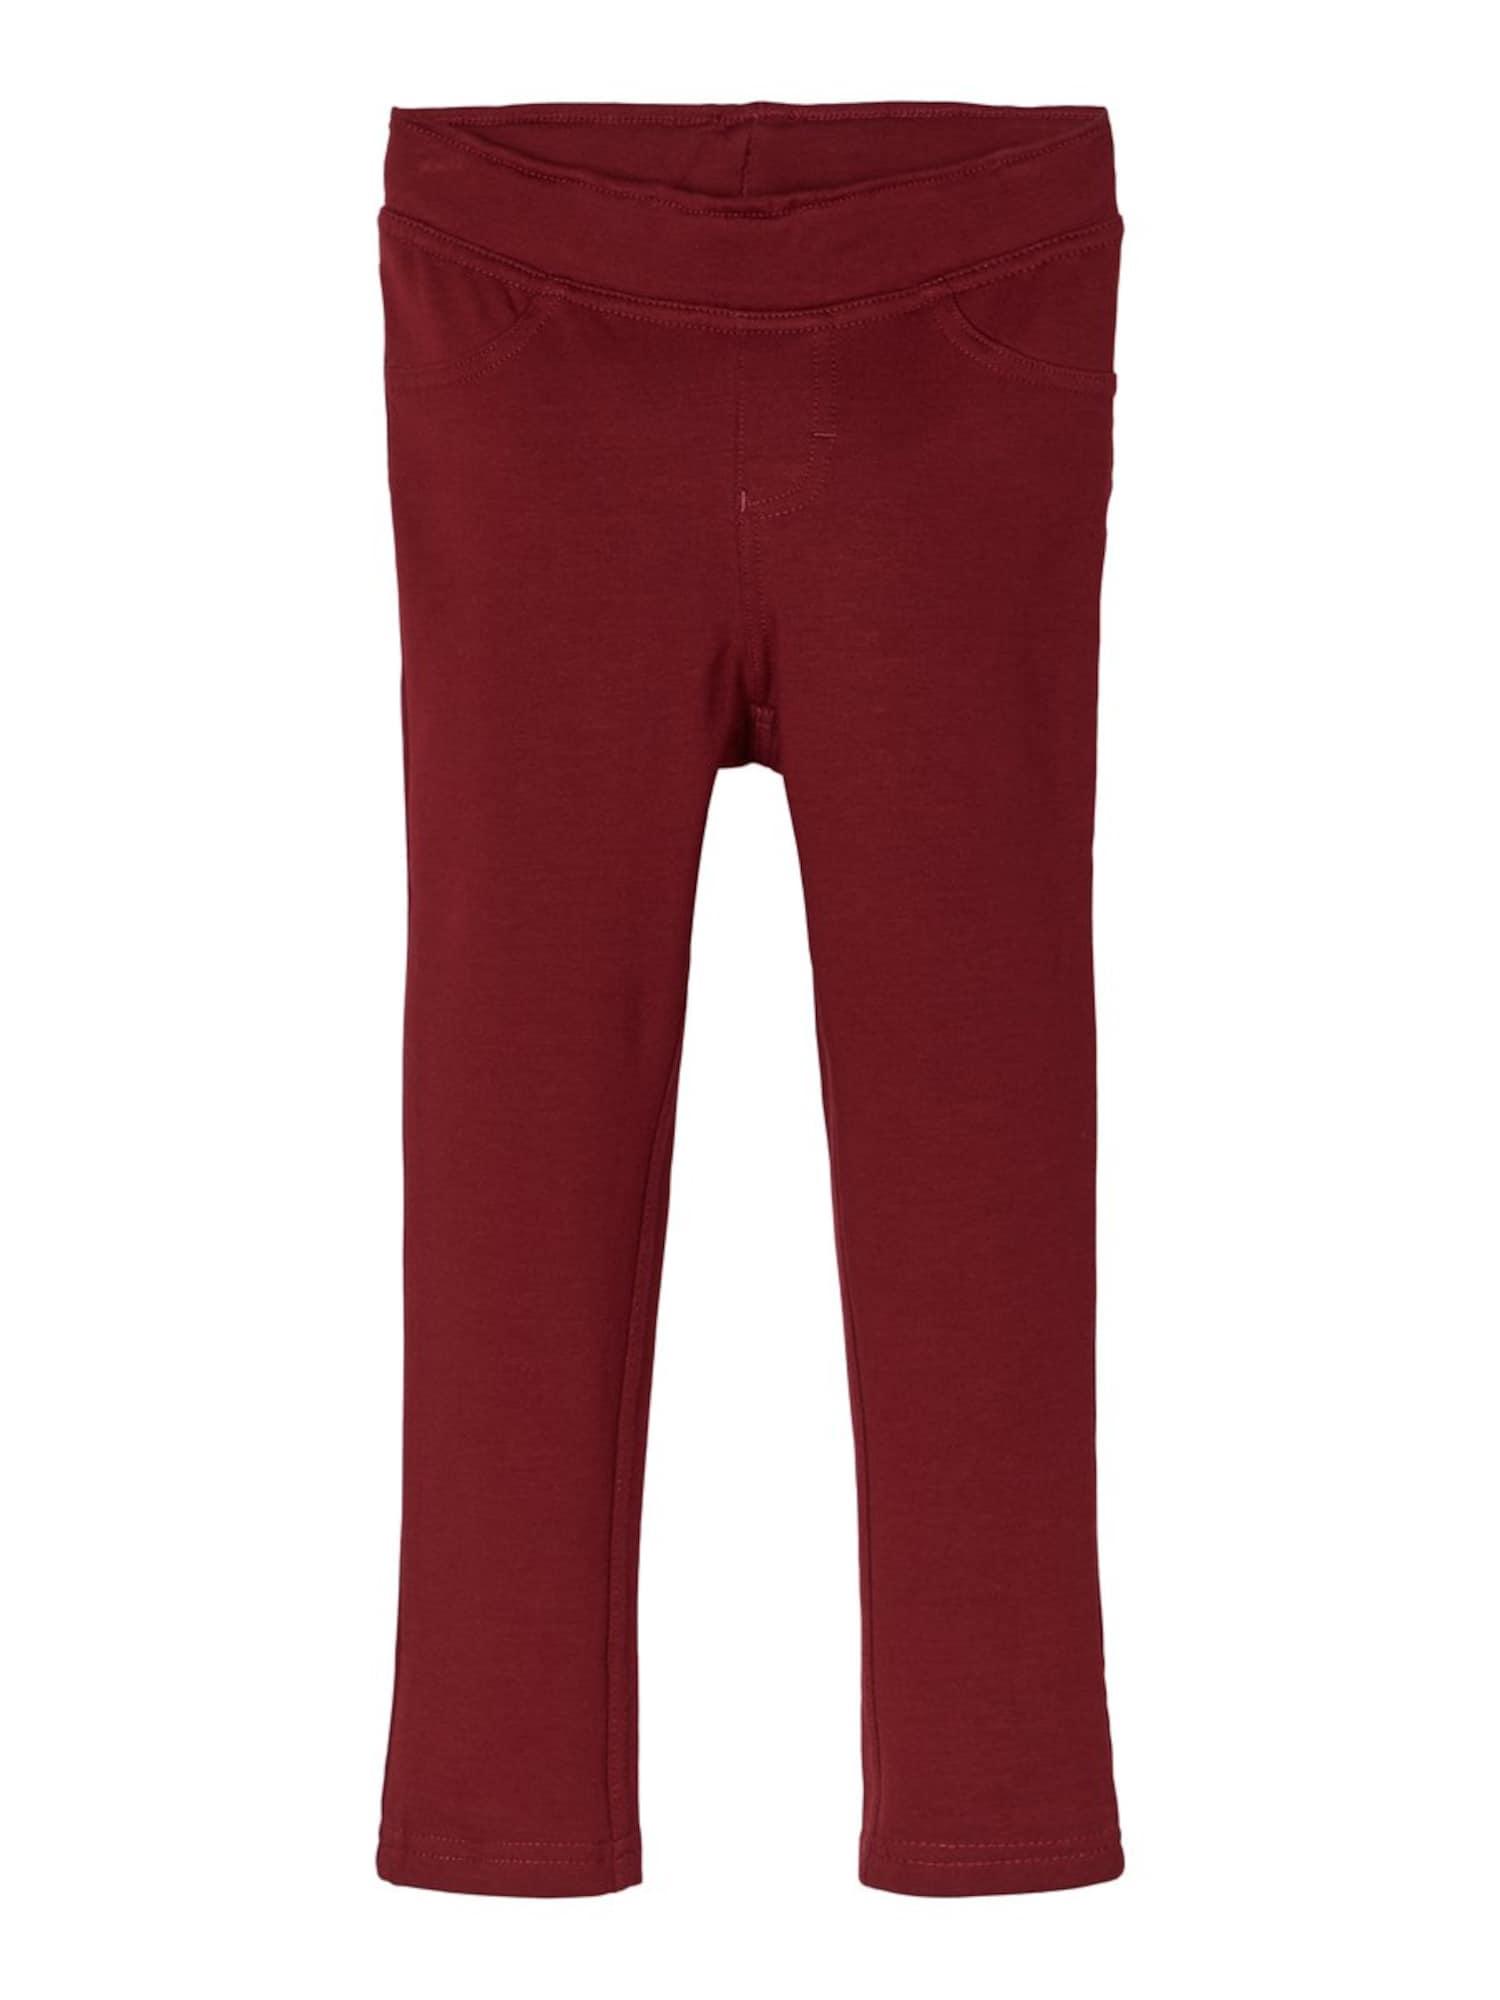 Miniboyhosen - Leggings - Onlineshop ABOUT YOU